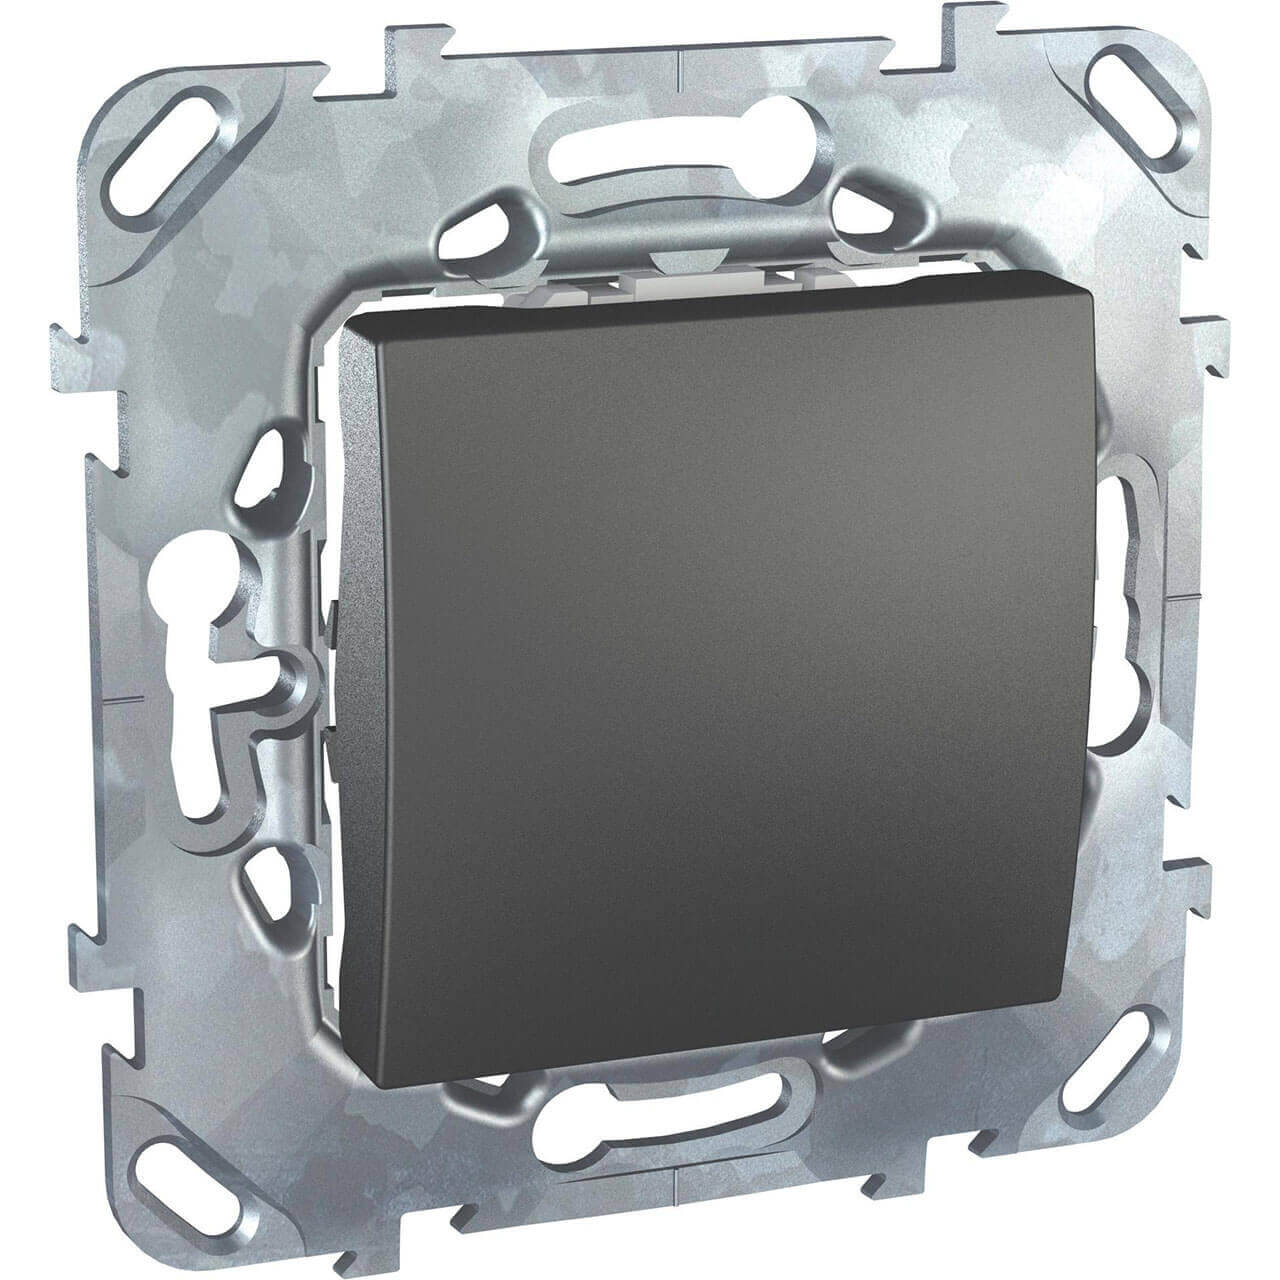 Выключатель одноклавишный Schneider Electric Unica 10AX 250V MGU5.201.12ZD заглушка 45х45 schneider electric unica mgu5 866 12zd